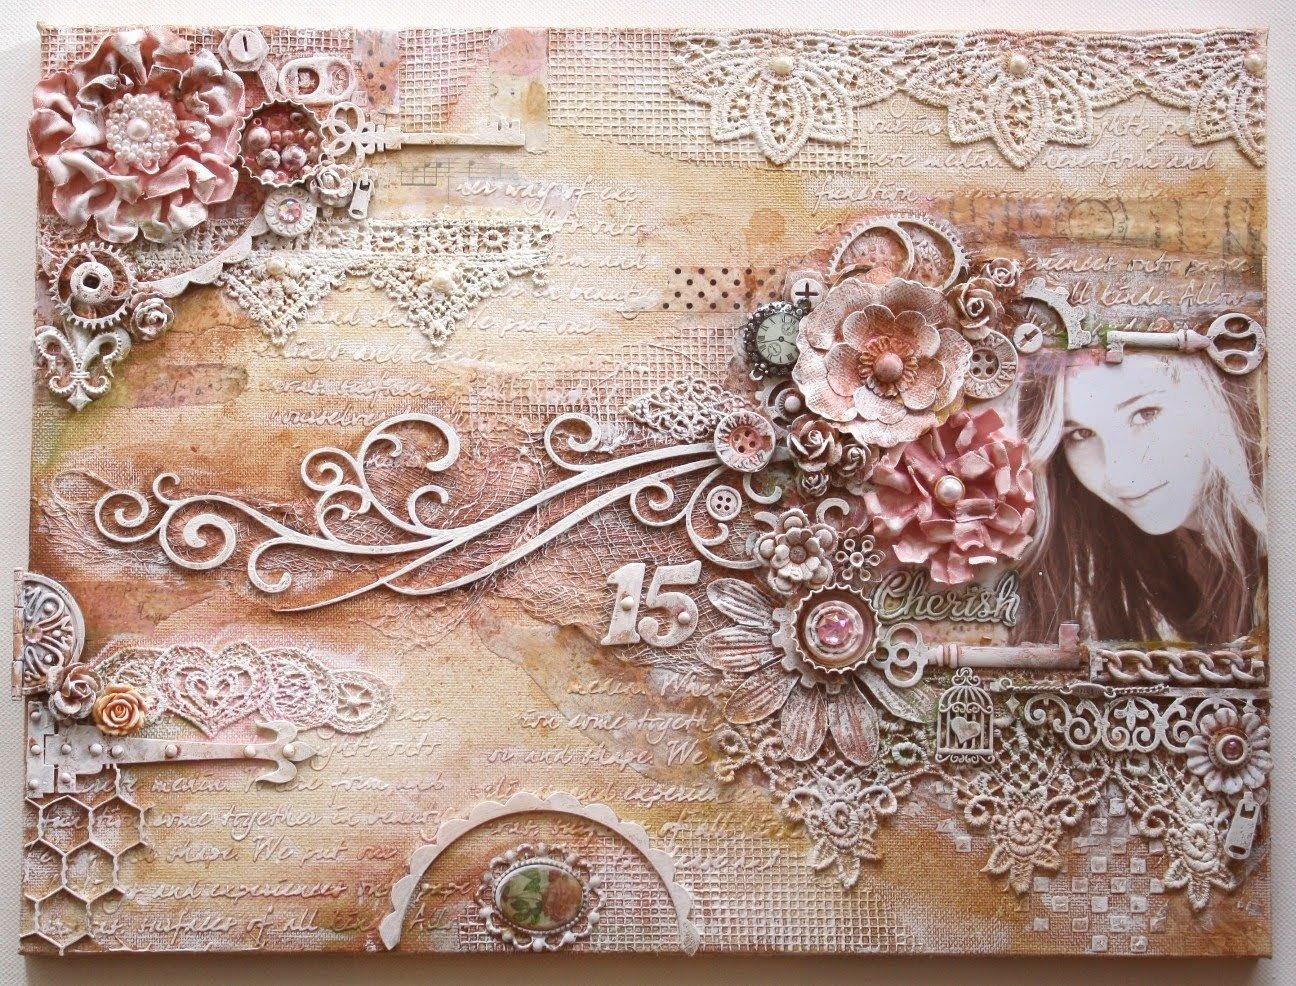 10 Lovable Mixed Media Canvas Art Ideas mixed media canvasgabrielle pollacco youtube